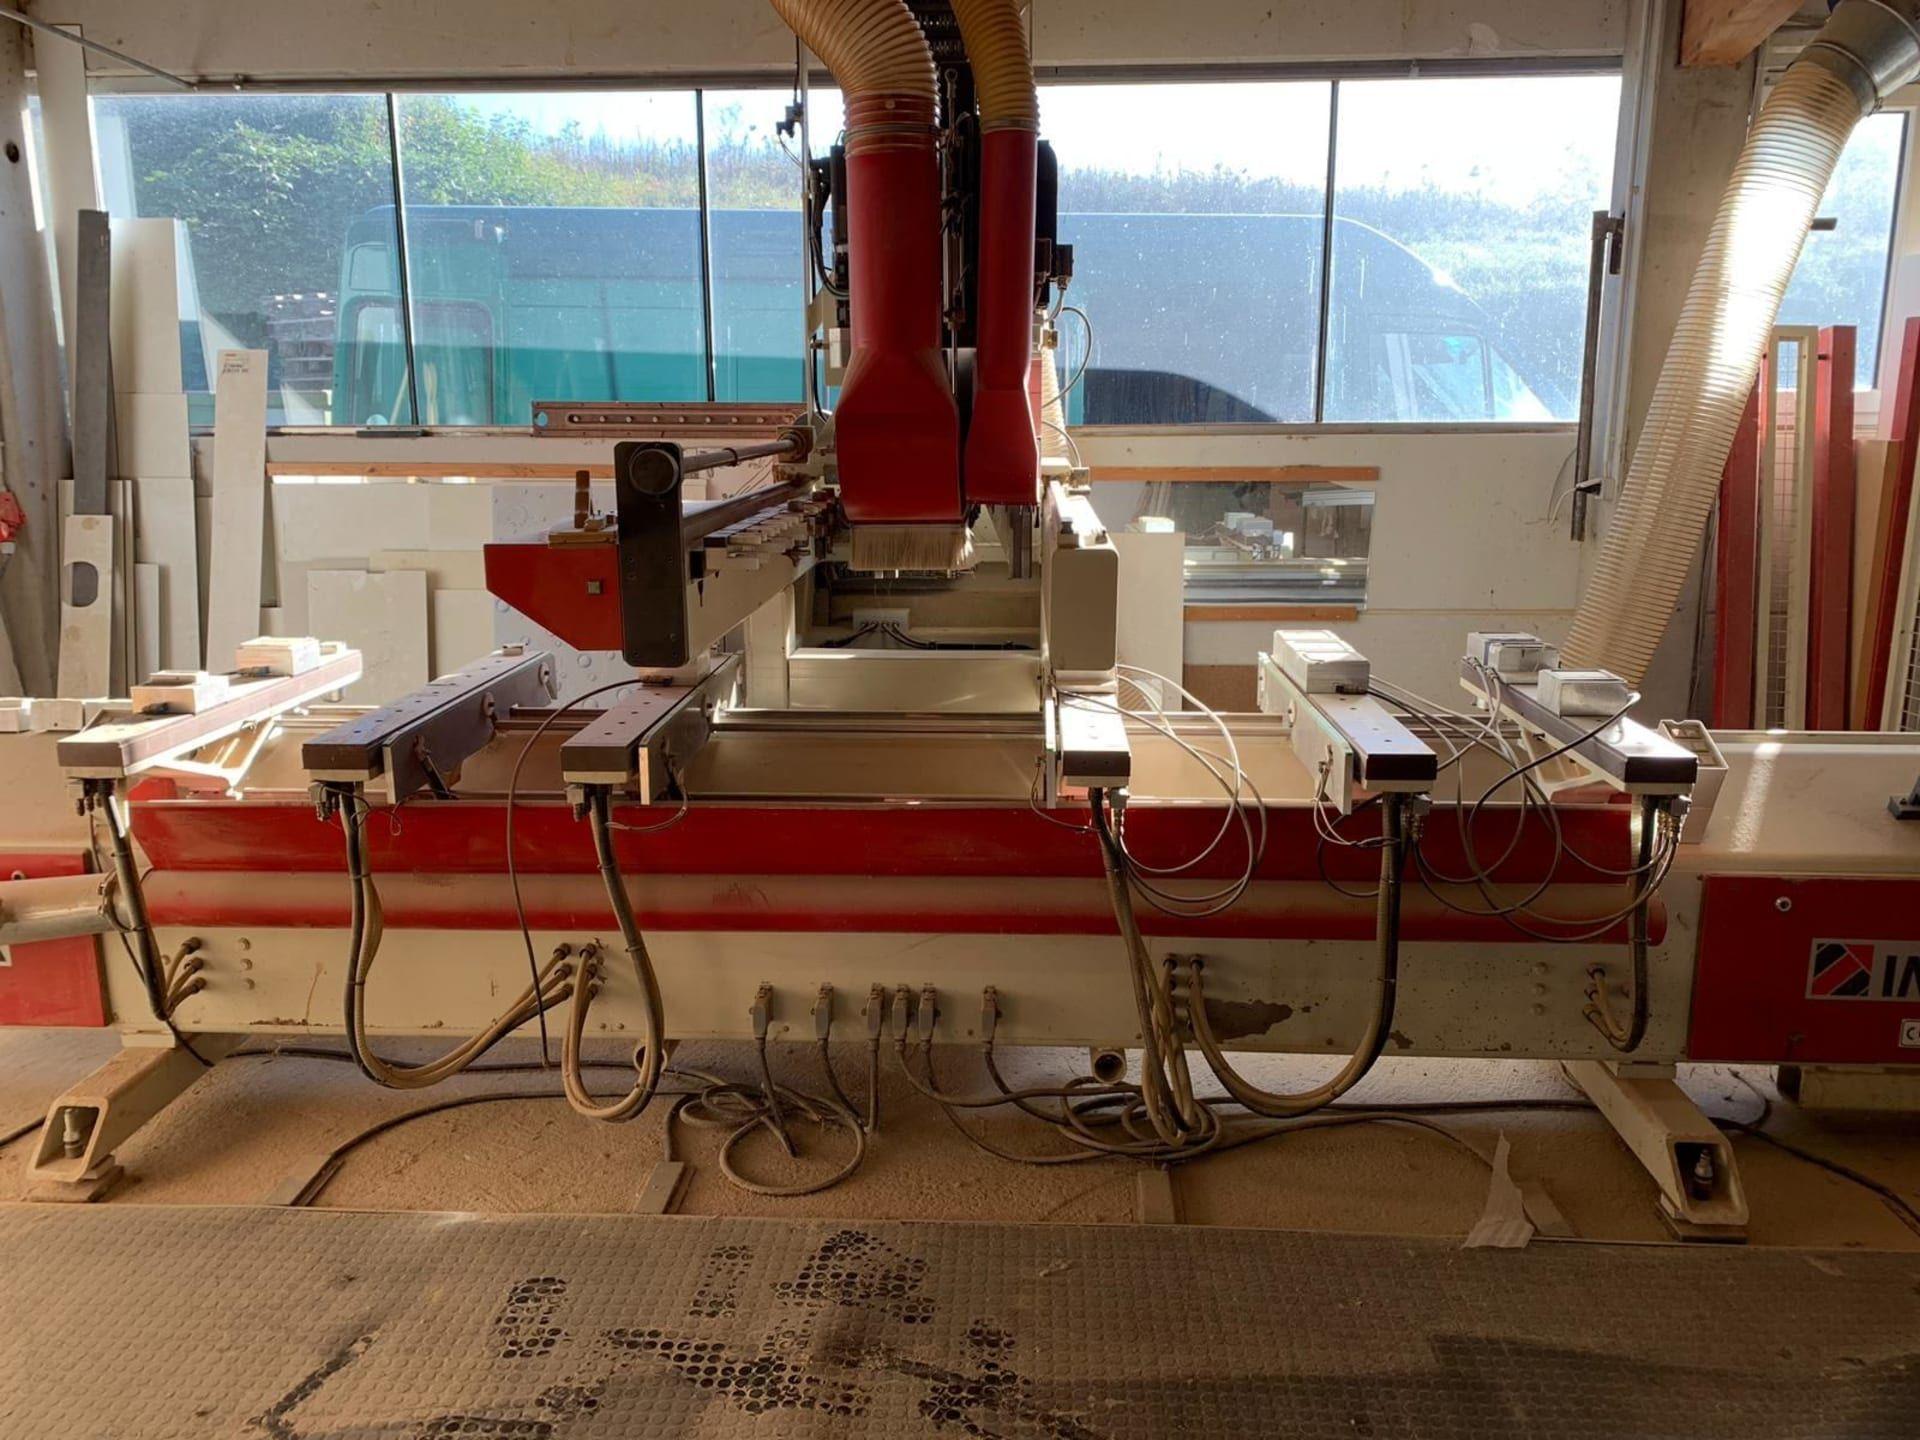 IMA Quadroflex CNC-Bearbeitungszentrum